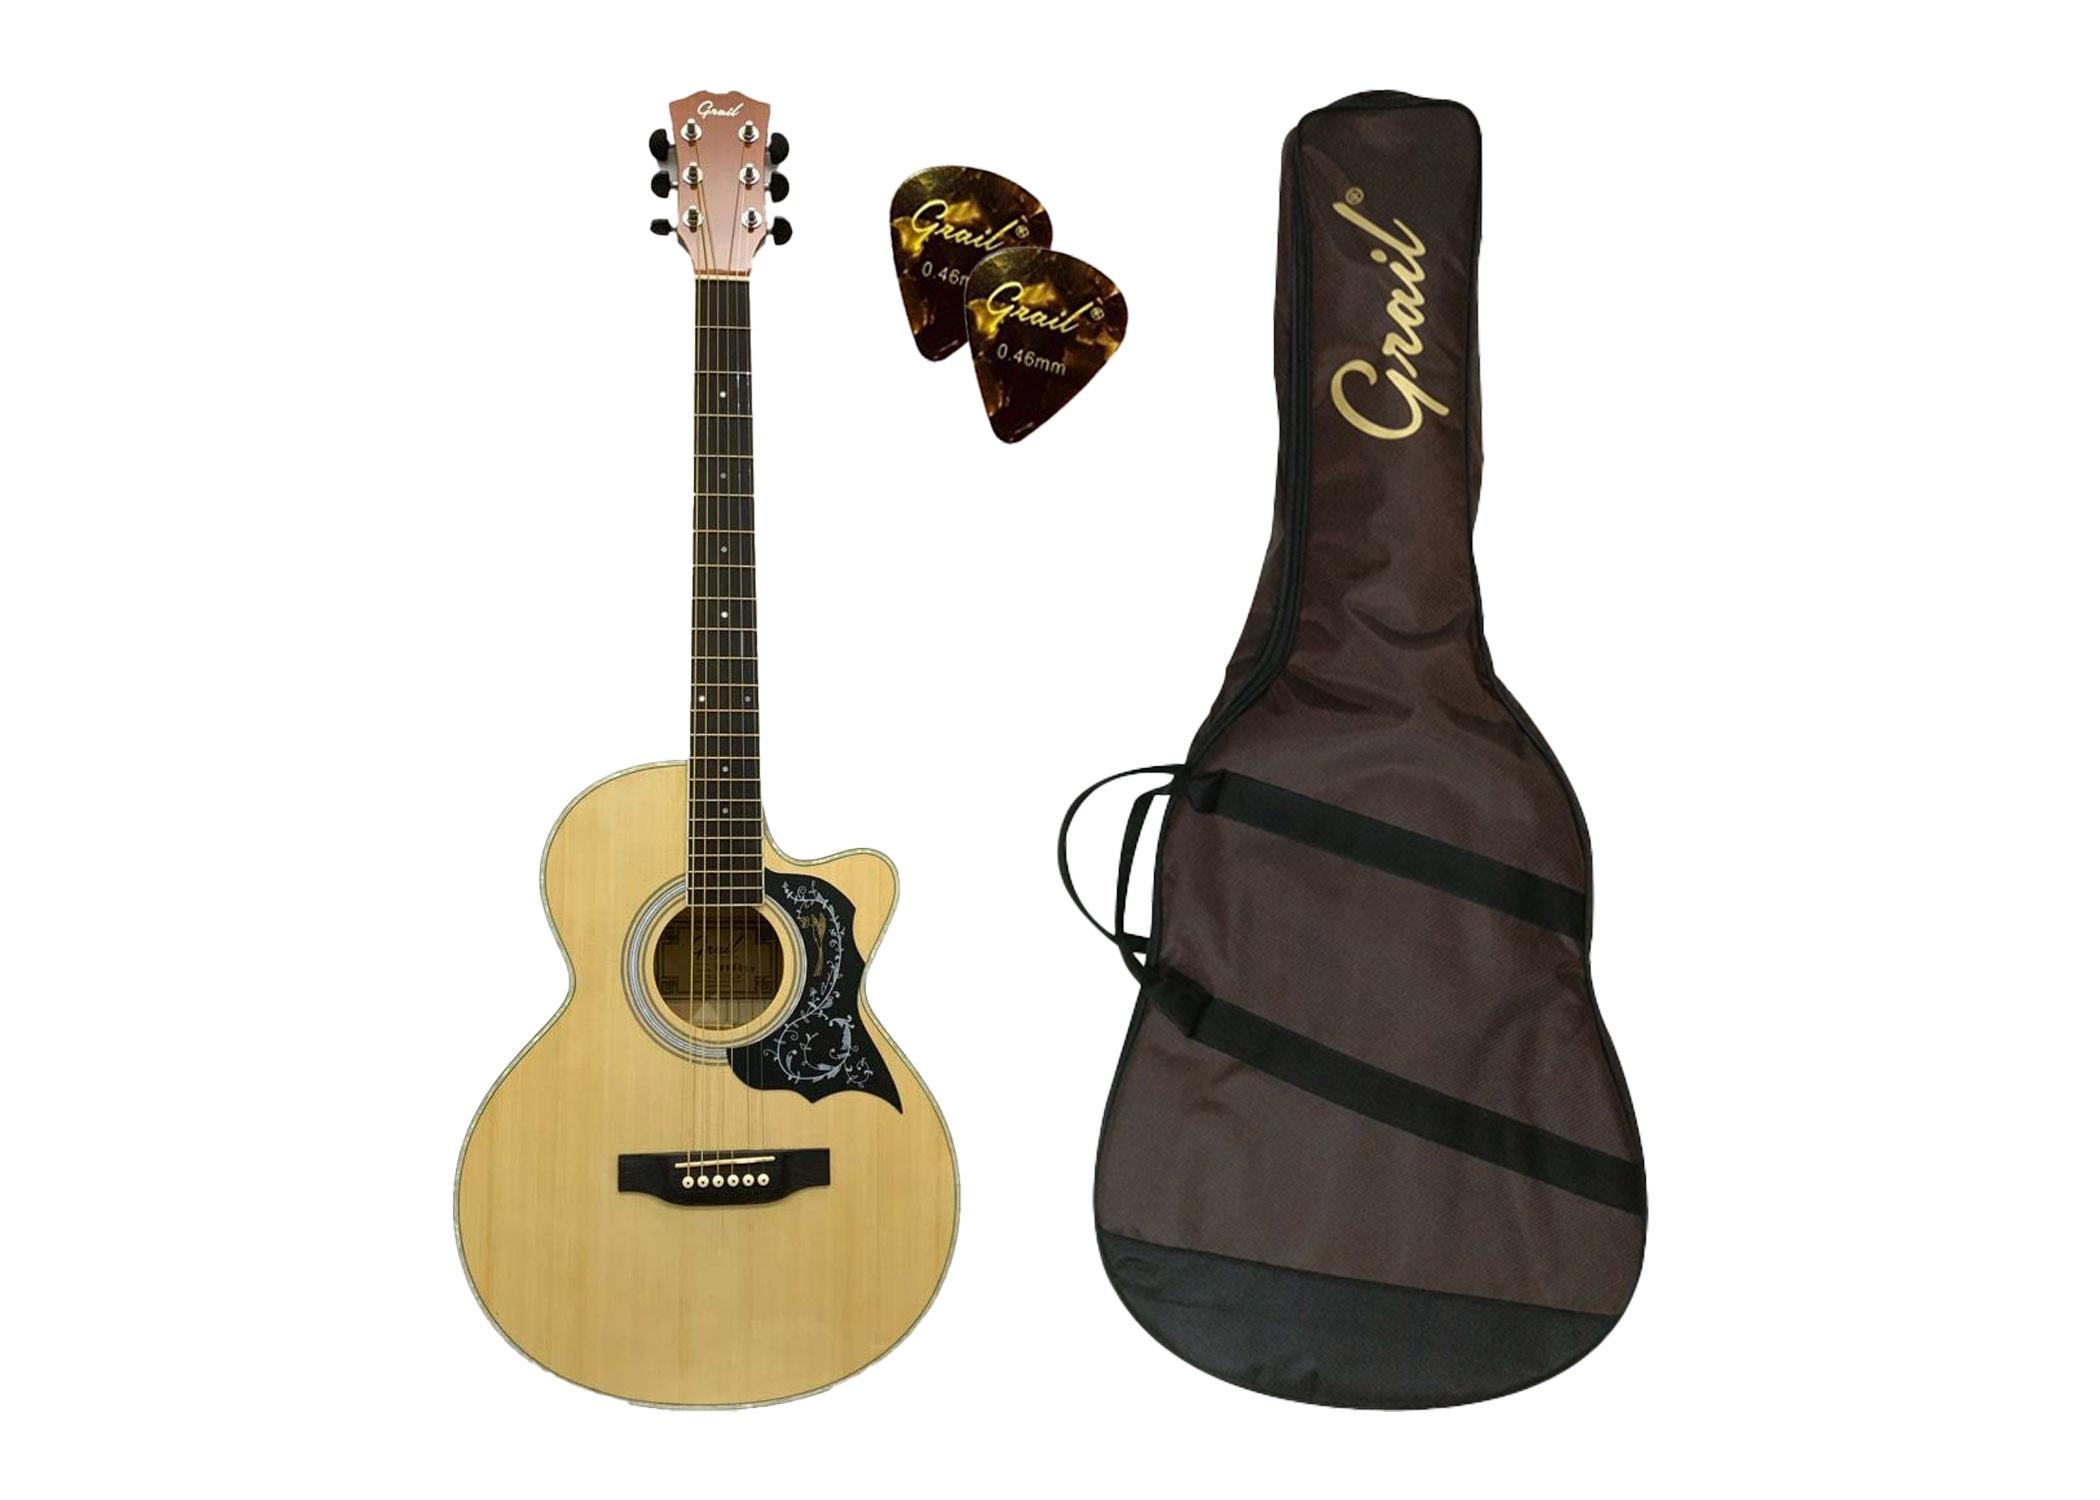 Grail Allure A190C SP Acoustic Guitar Cutaway Spruce Top